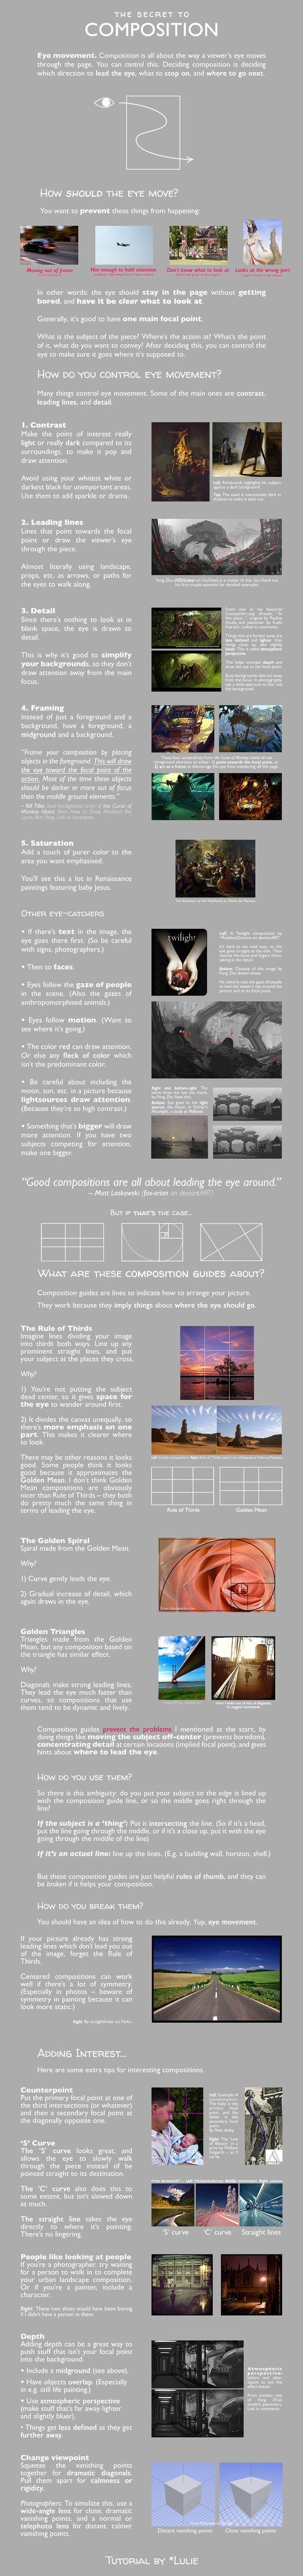 The Secret to Composition by Lulie.deviantart.com on @deviantART: